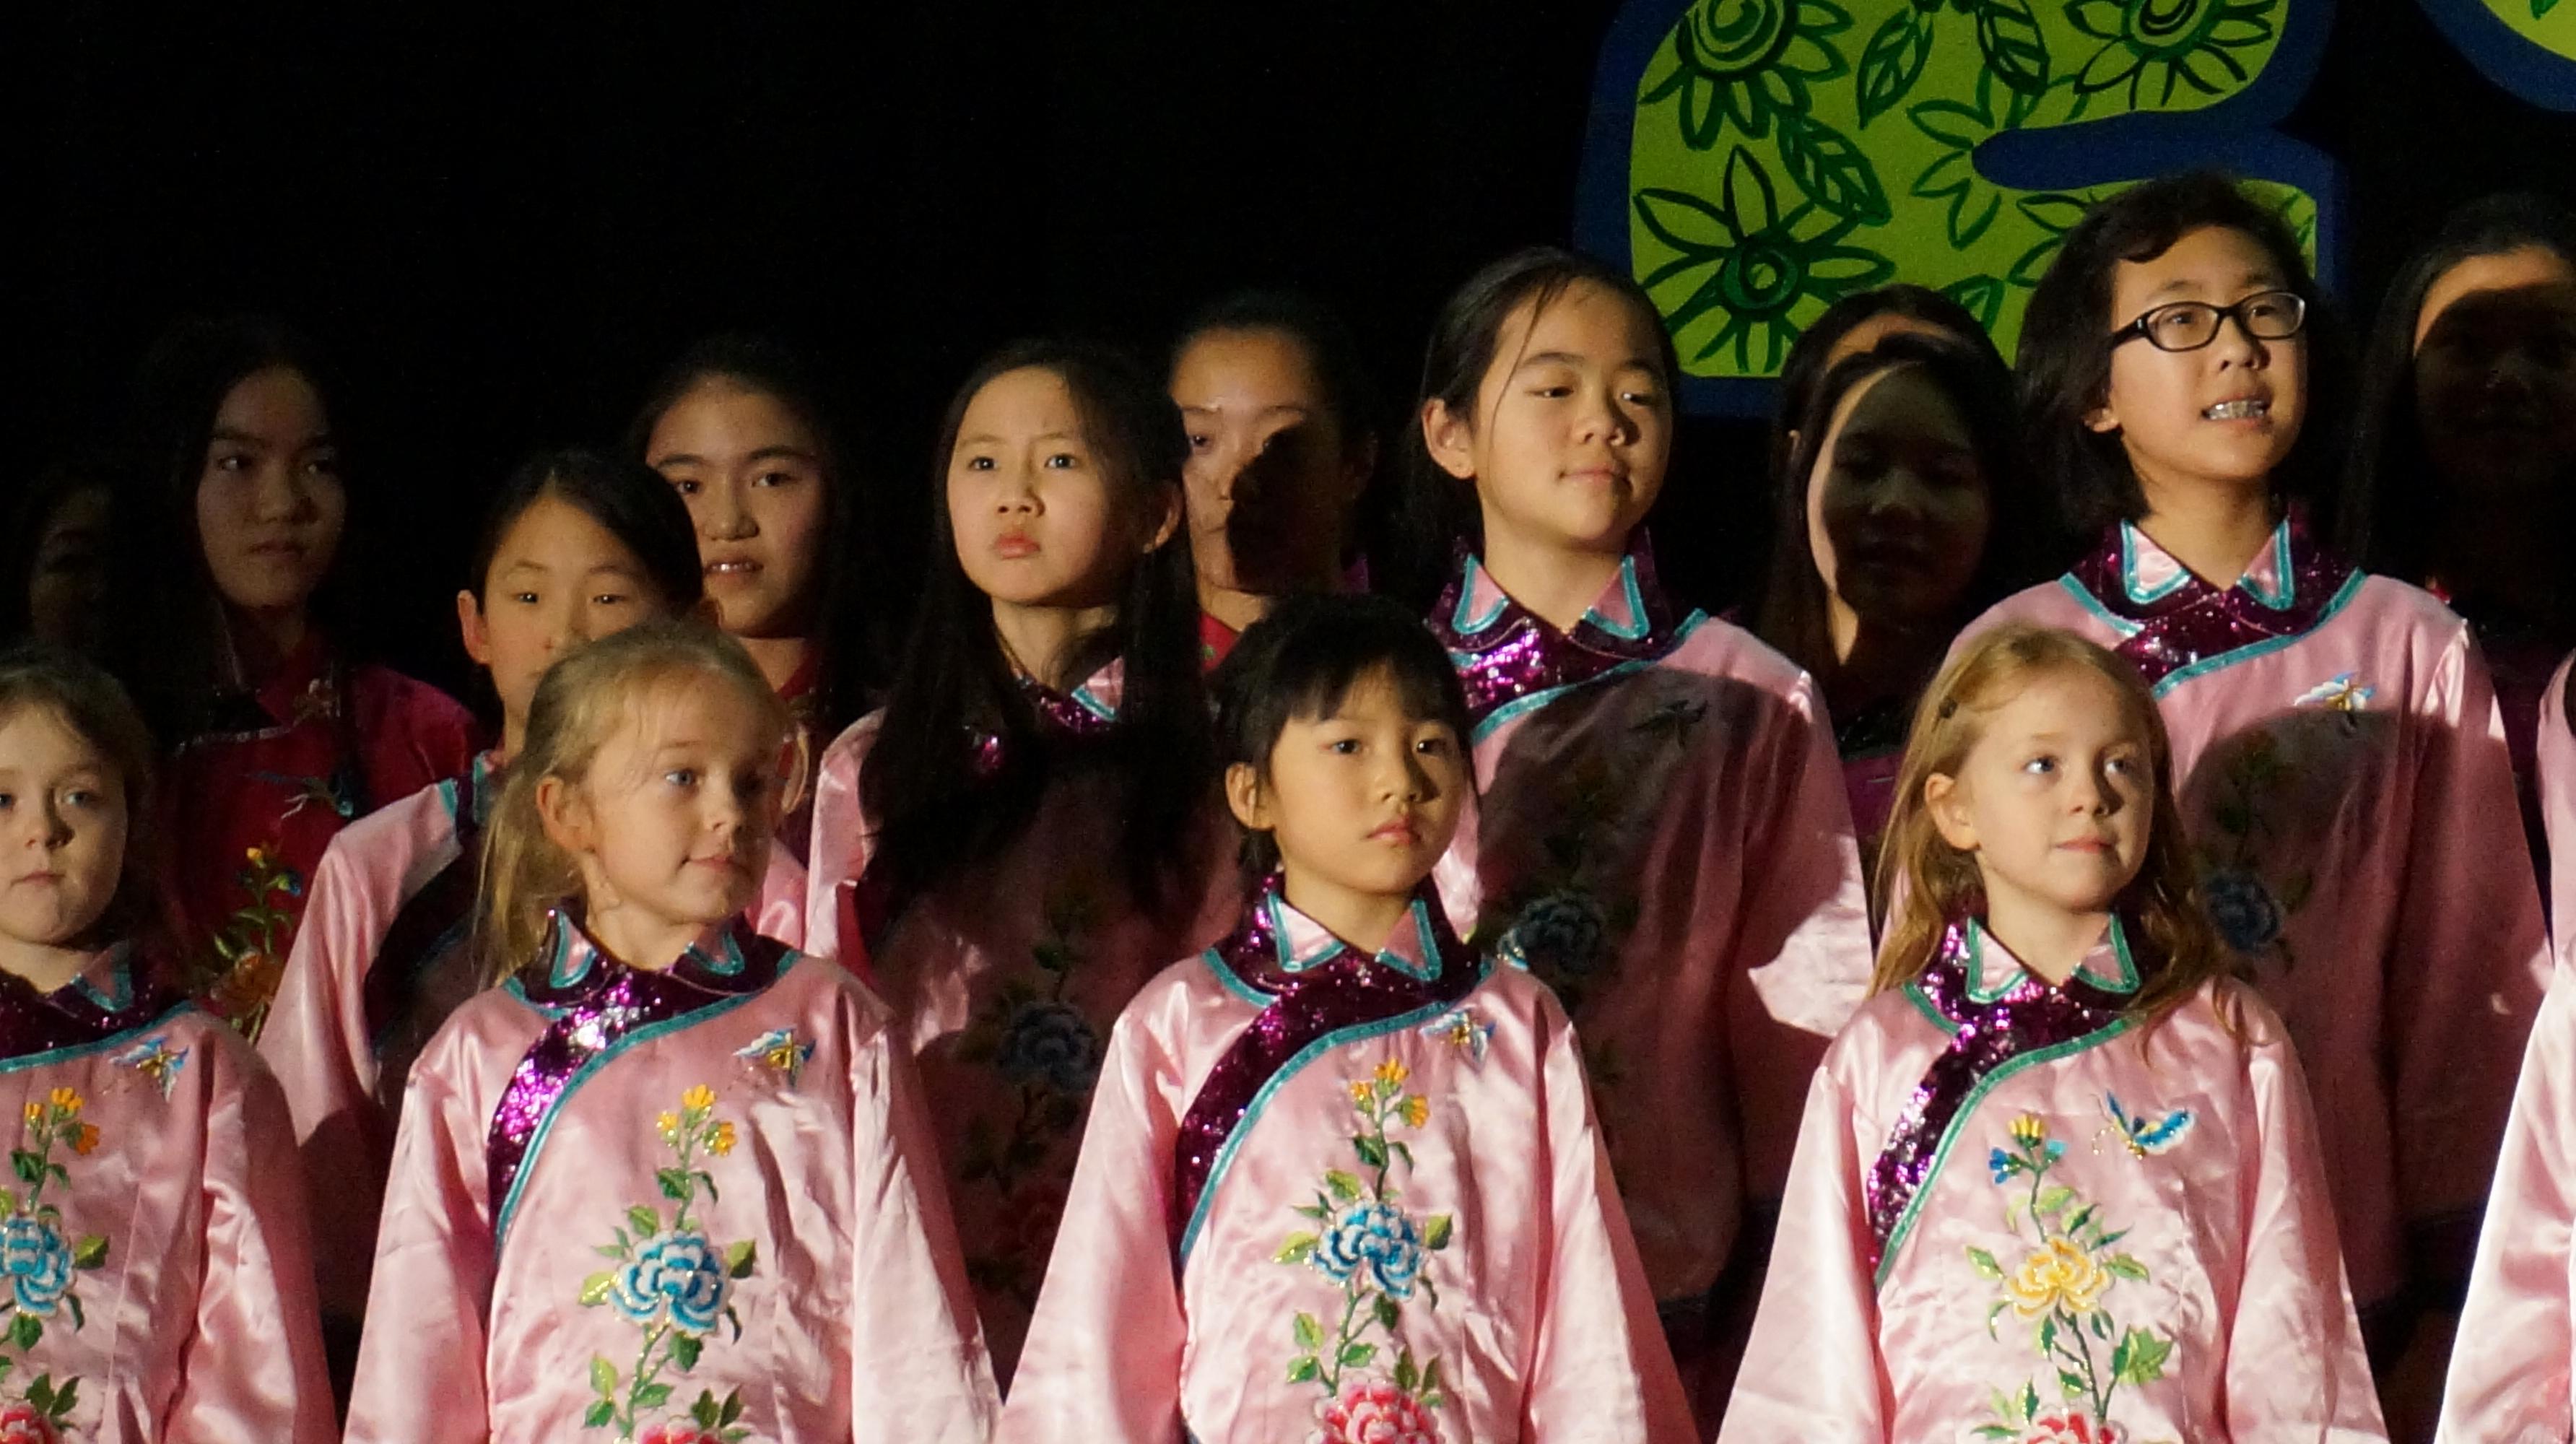 98491e997399b11a6ce5_aaa_Chinese_New_Year_pix_443.JPG